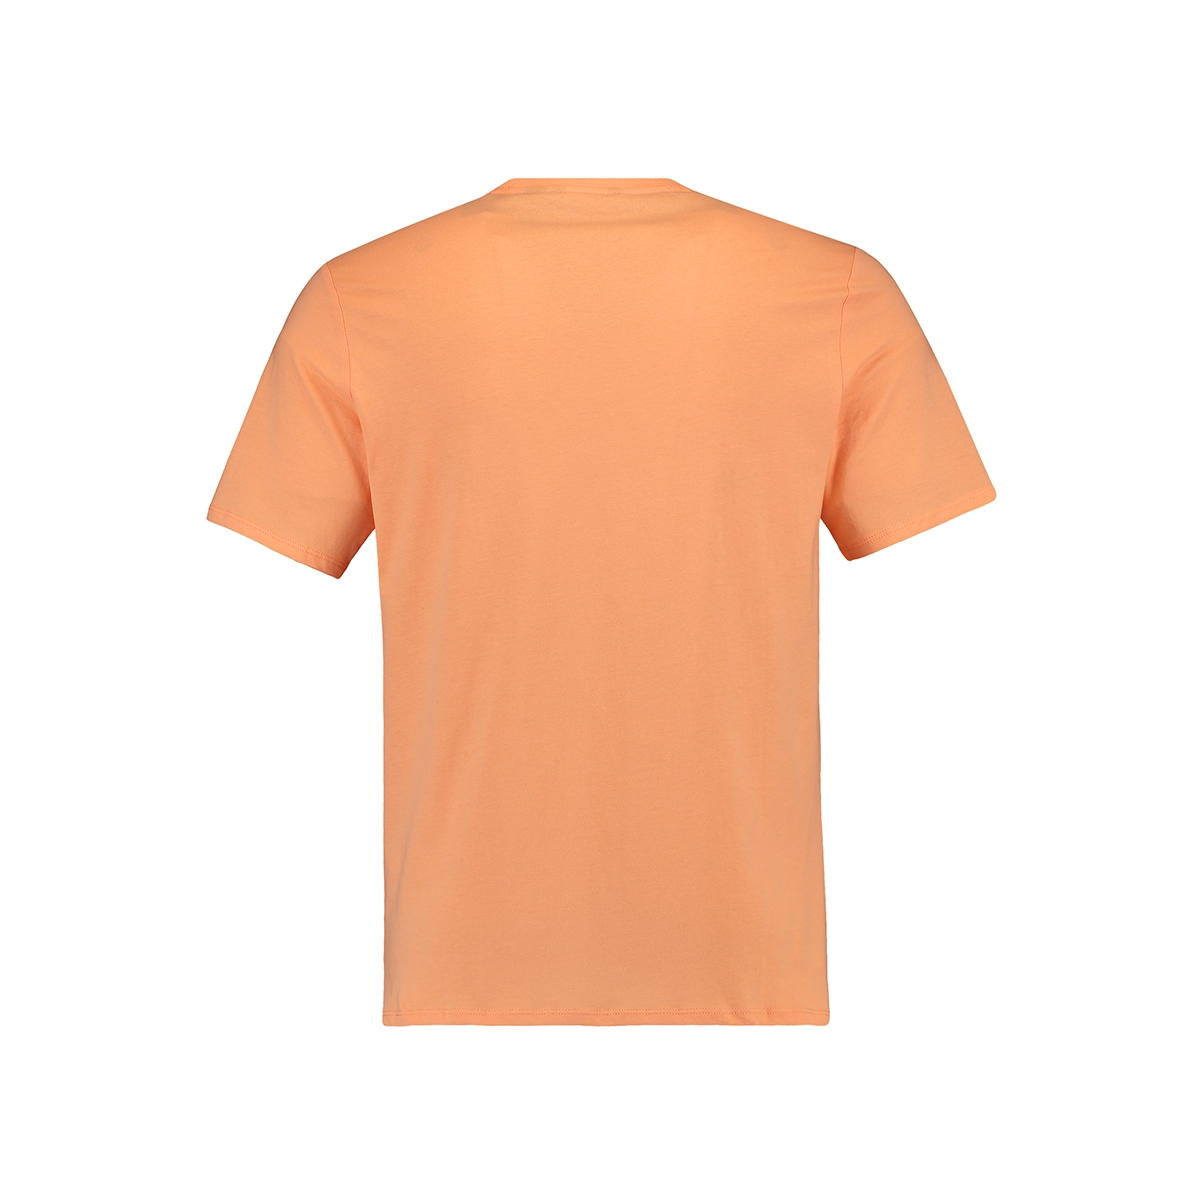 lm ocotillo t shirt 0a2302 o`neill t-shirt 3122 canteloupe